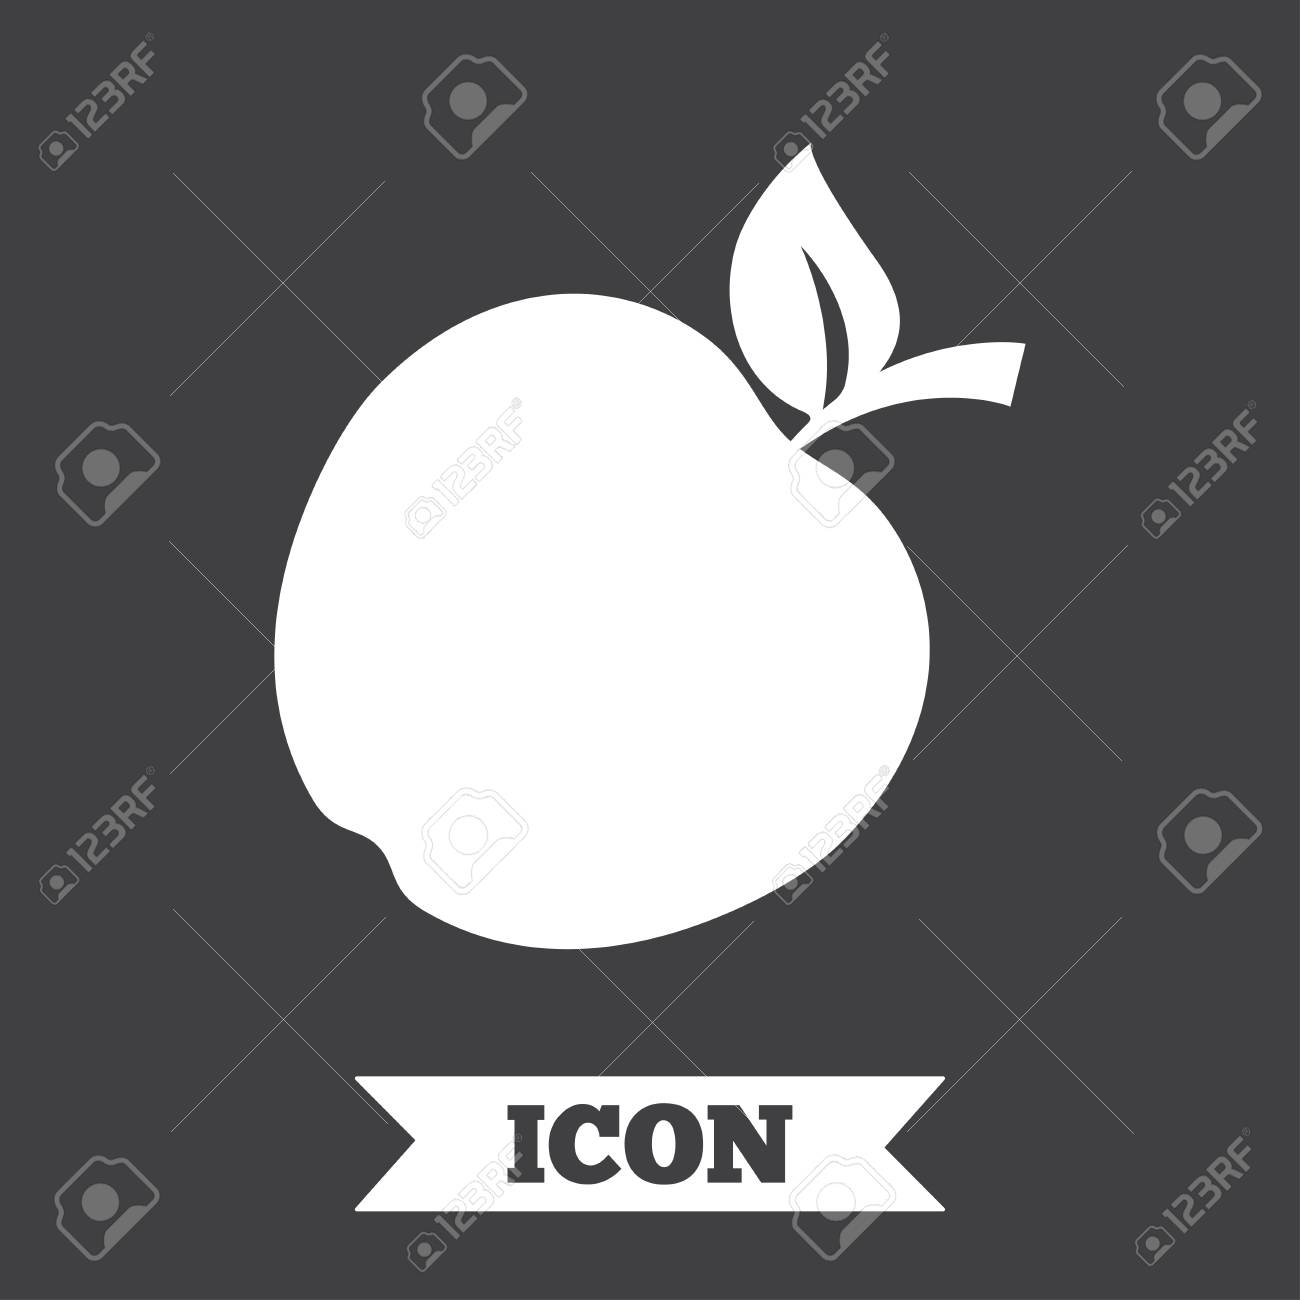 Apple Sign Icon Fruit With Leaf Symbol Graphic Design Element